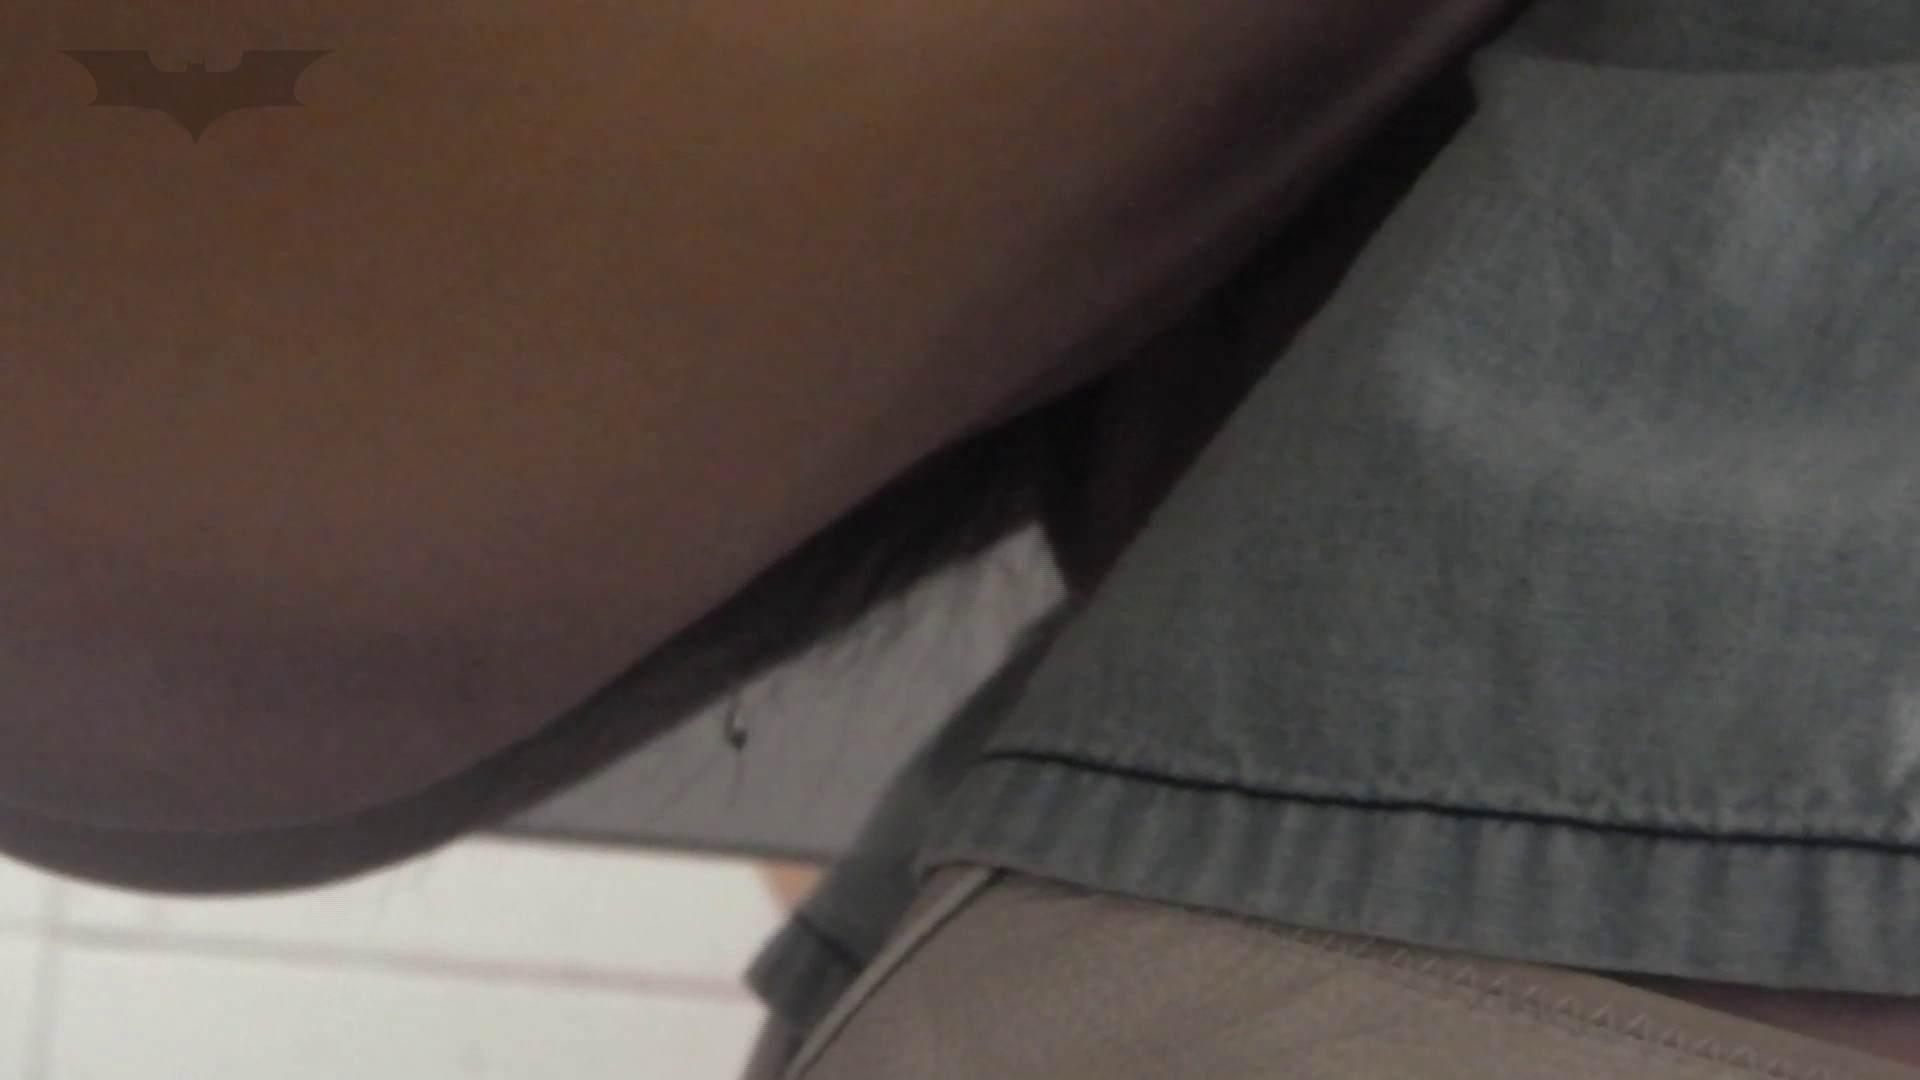 潜入!!台湾名門女学院 Vol.04 二ケツ同時撮り!! 丸見え 濡れ場動画紹介 101枚 75